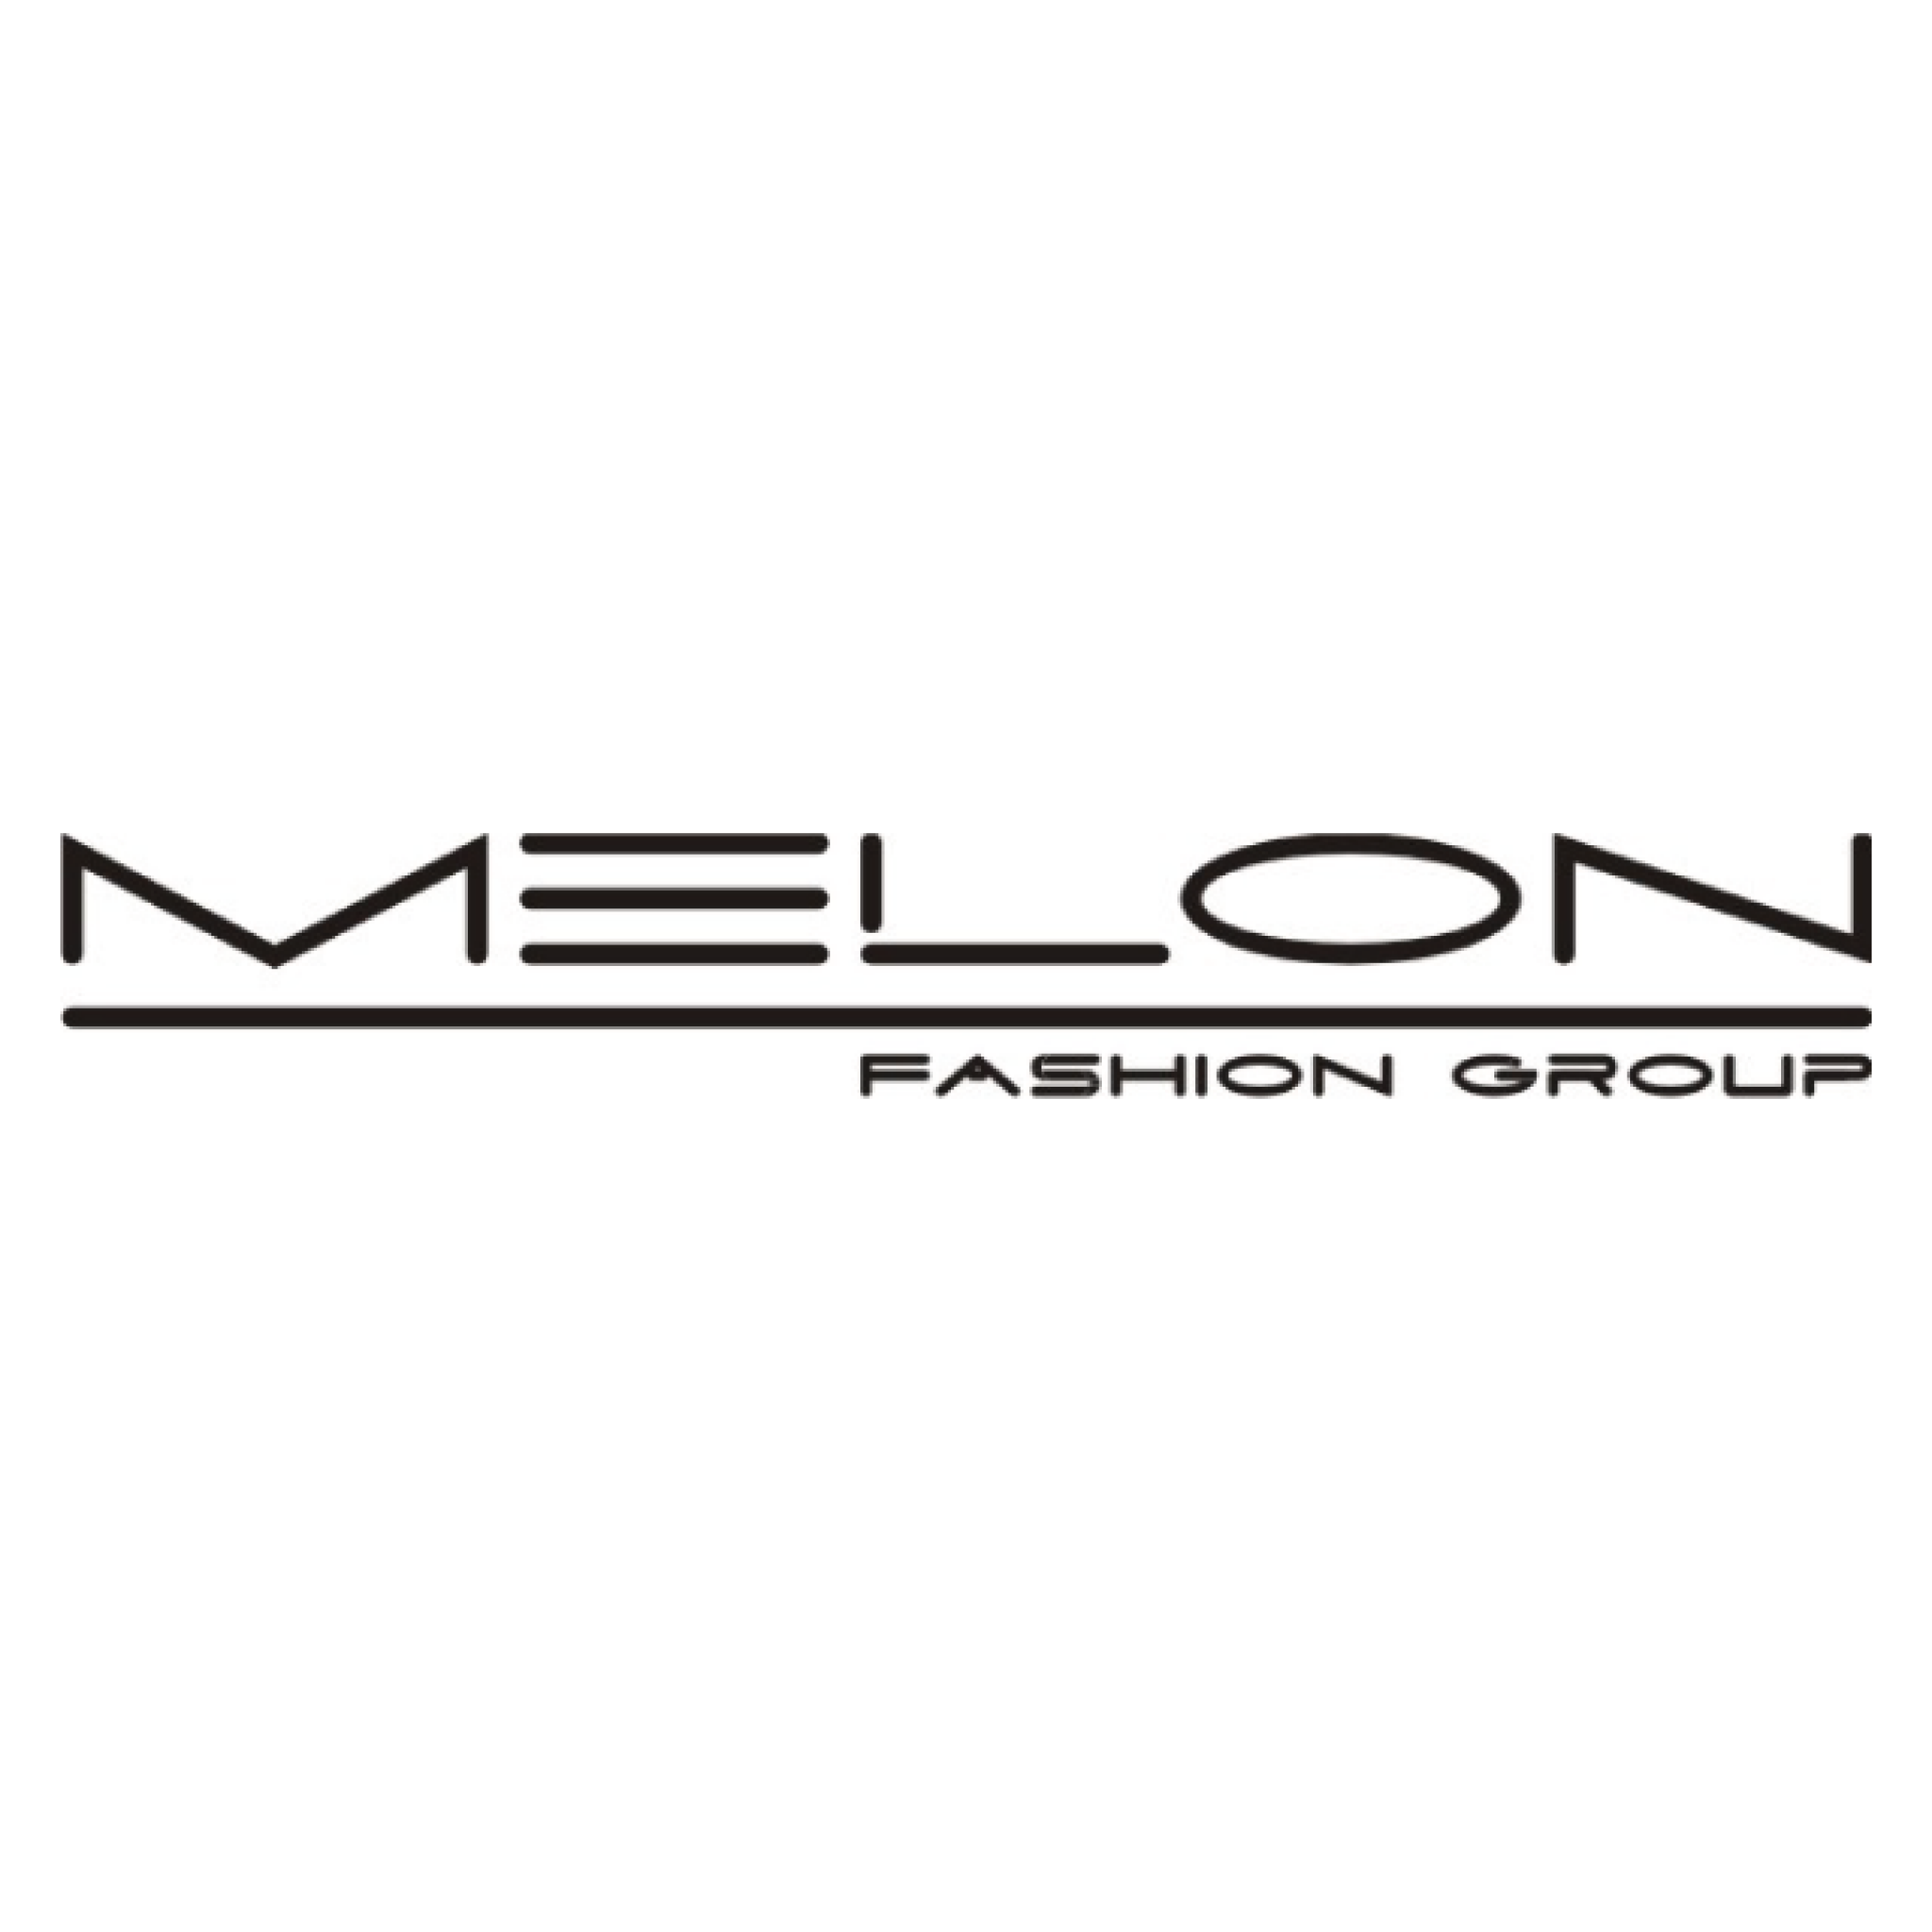 30bcc032f0f83 Офис компании Melon Fashion Group в Санкт-Петербург ищет кандидатов ...